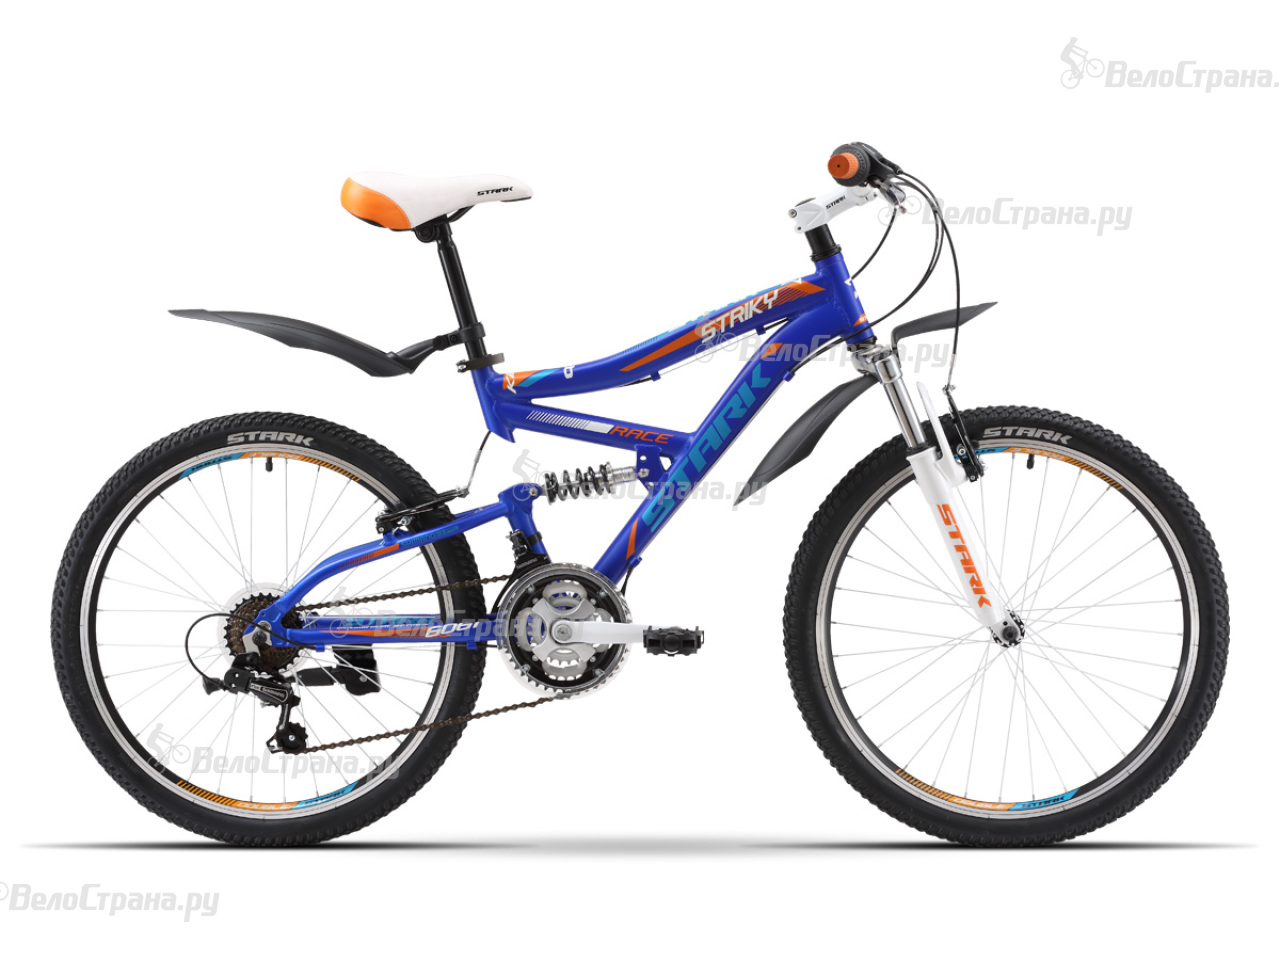 Велосипед Stark Striky FS (2016) велосипед challenger mission lux fs 26 черно красный 16